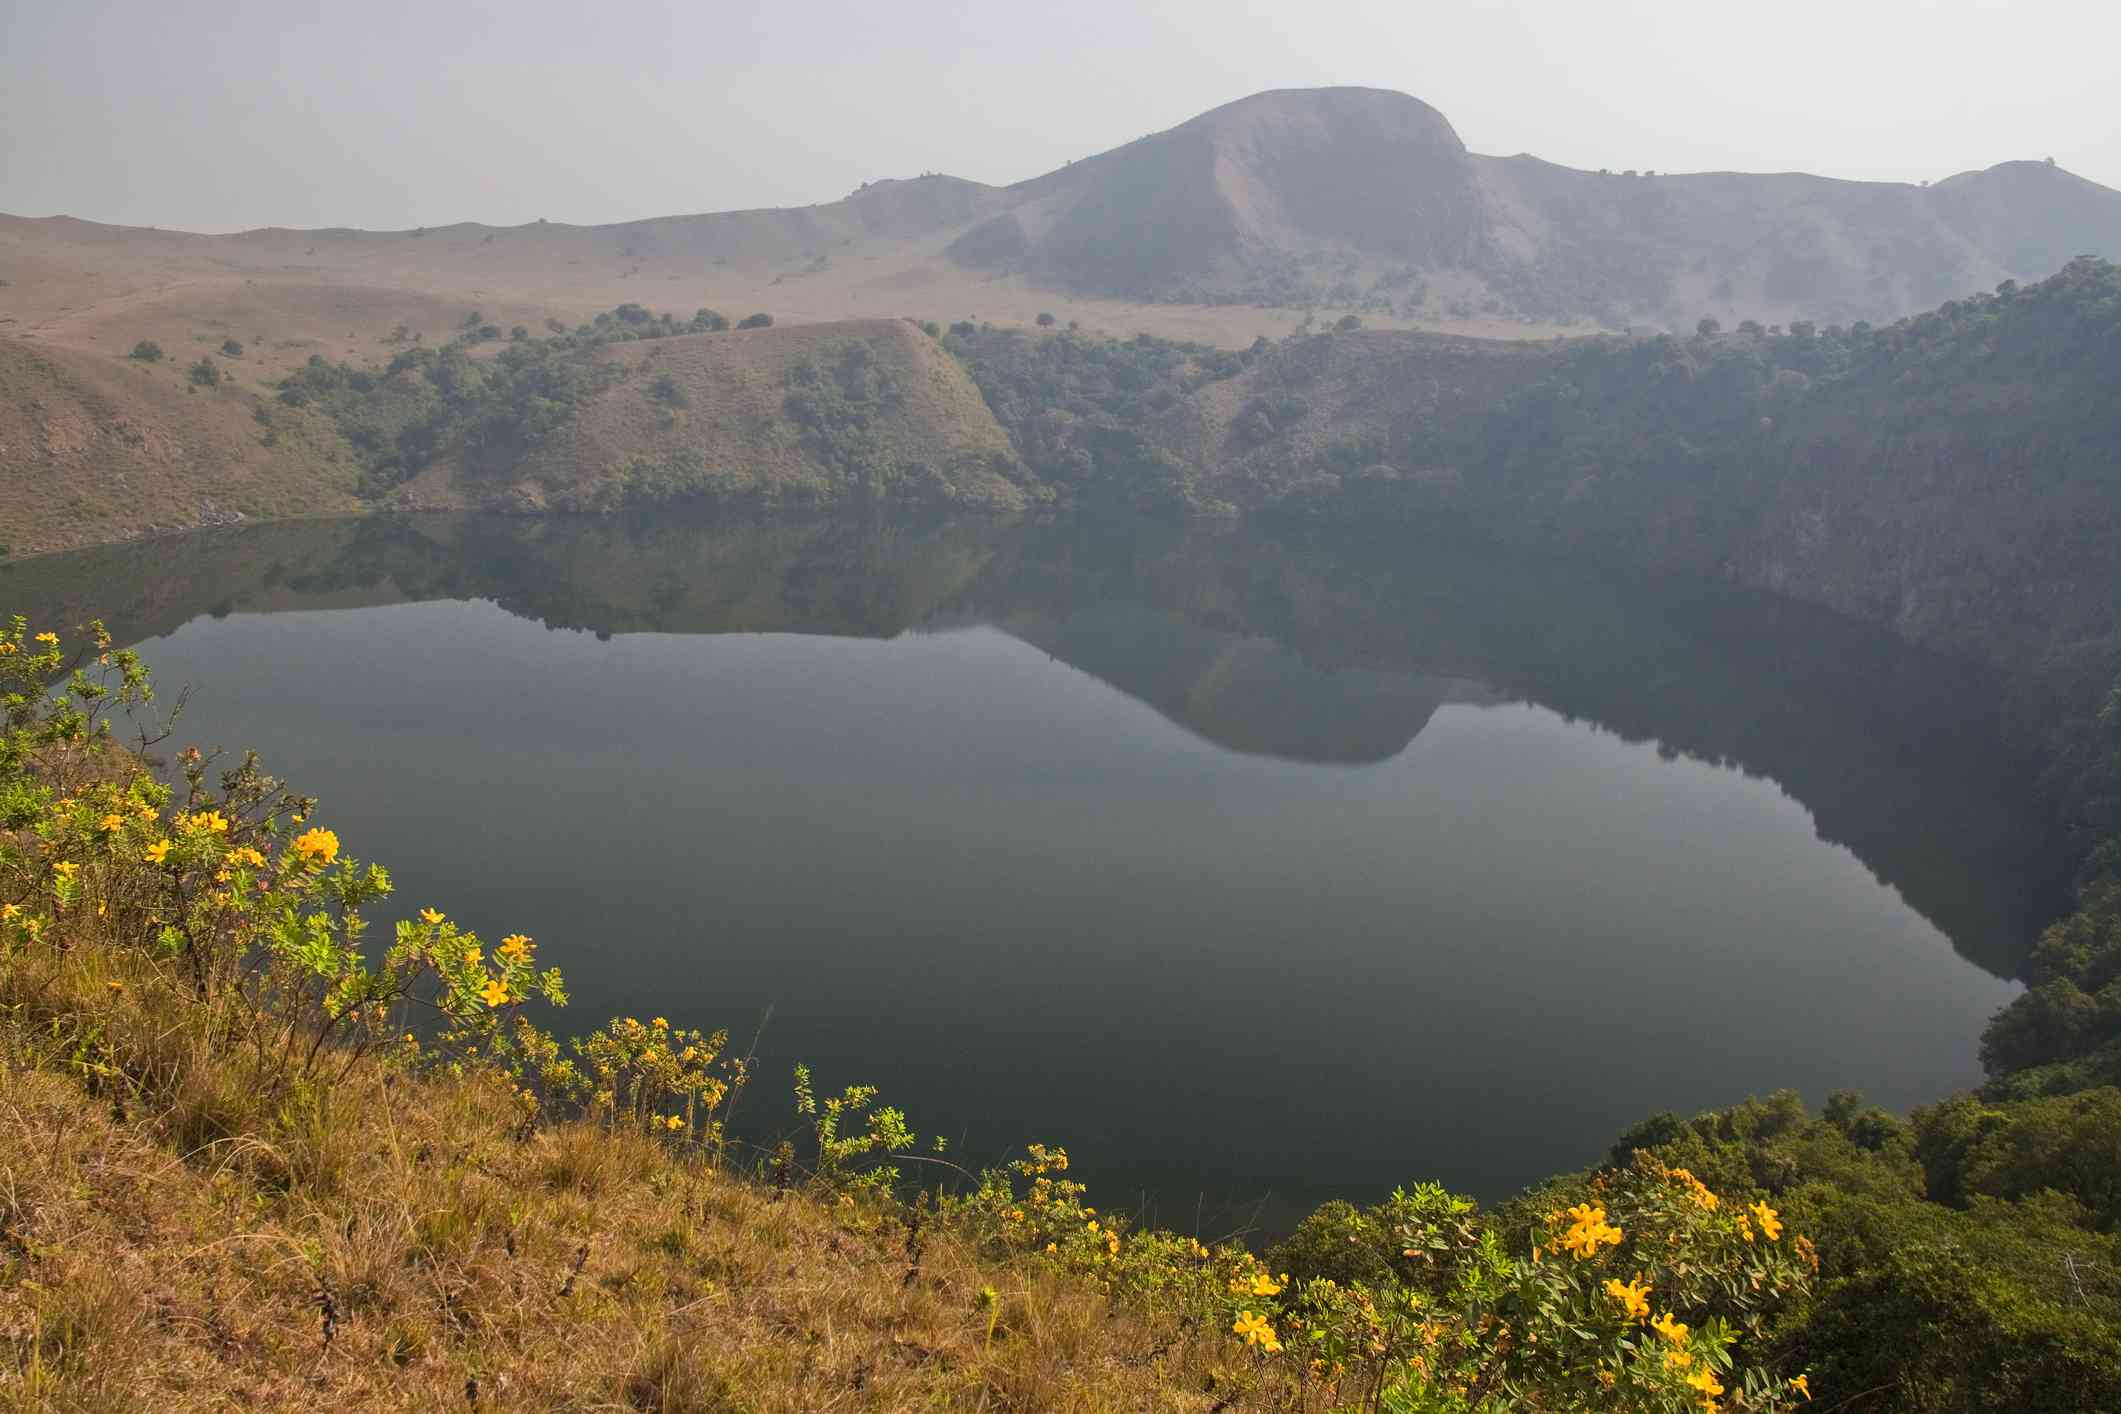 The 'Man' Lake - Manengouba Volcanic Lakes near Bangem, Cameroon